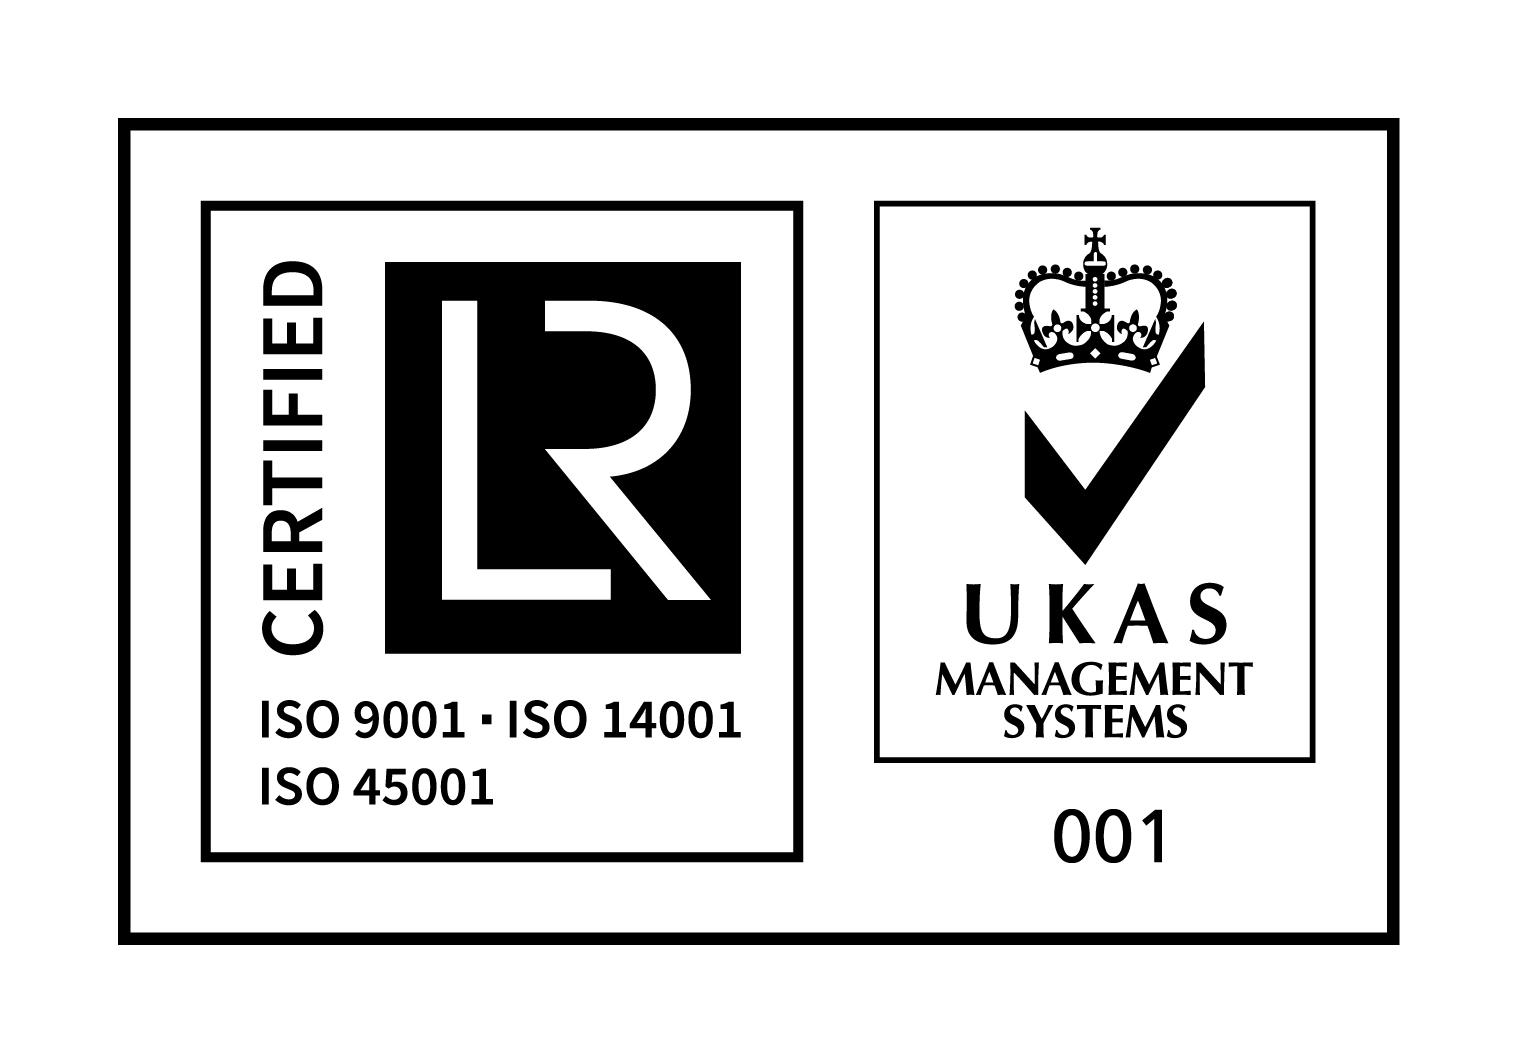 UKAS ISO 9001, 14001 & 45001